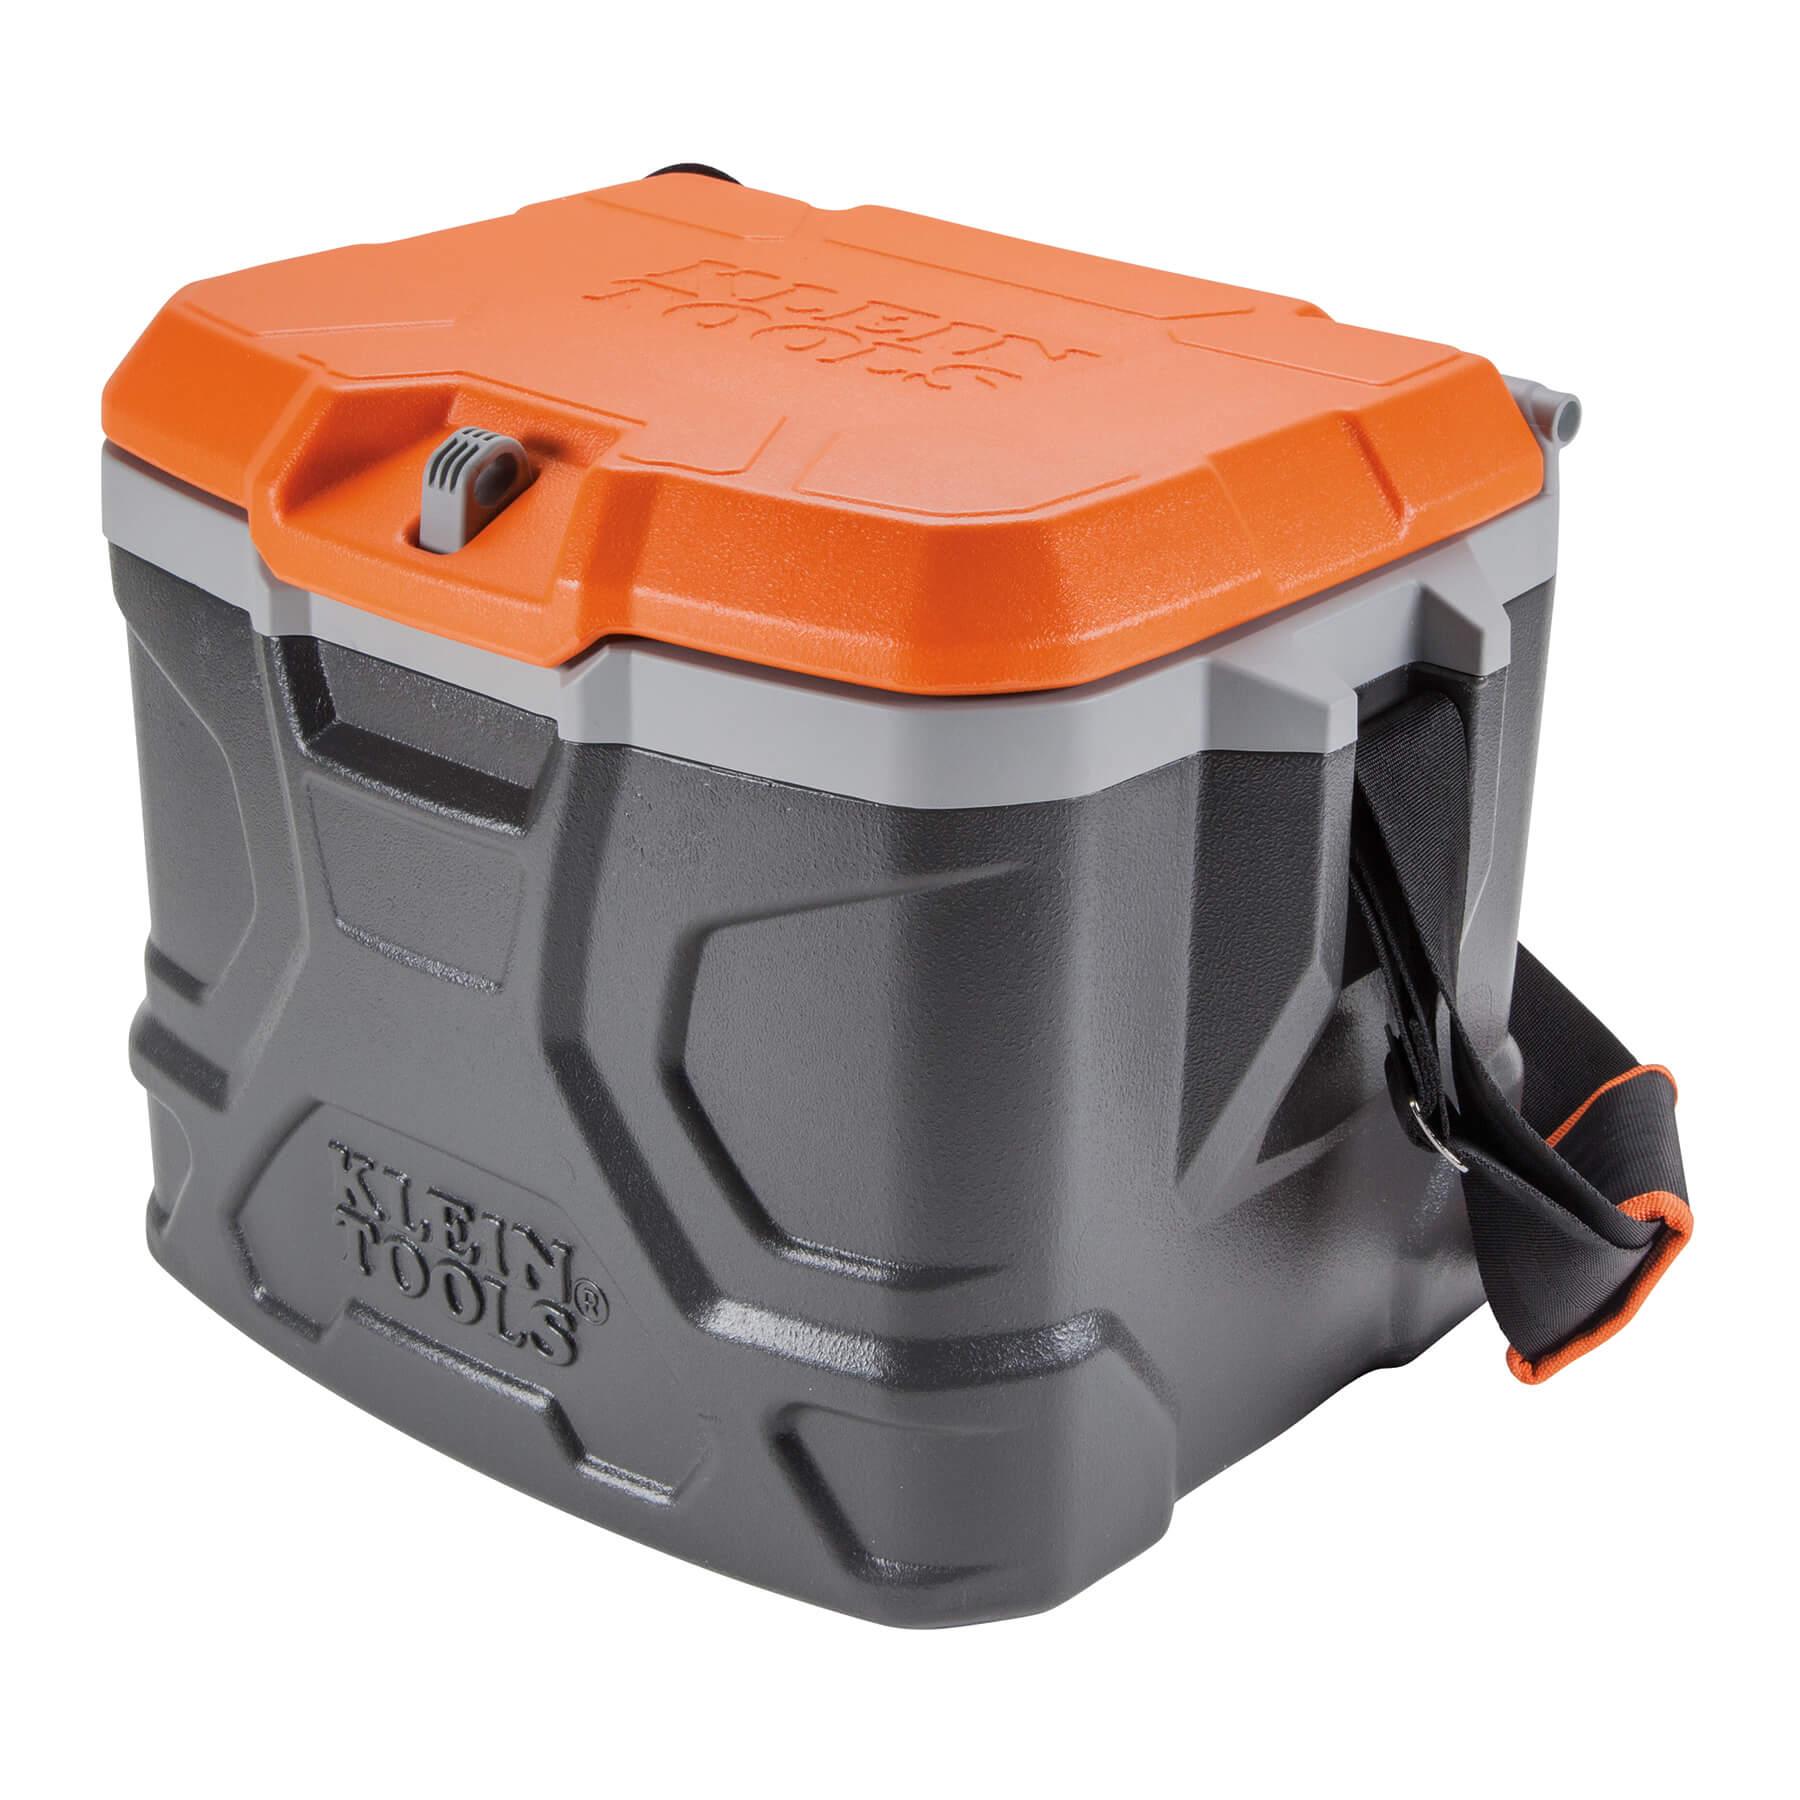 Industrial, Over Shoulder Tradesman Pro Tough Box Cooler